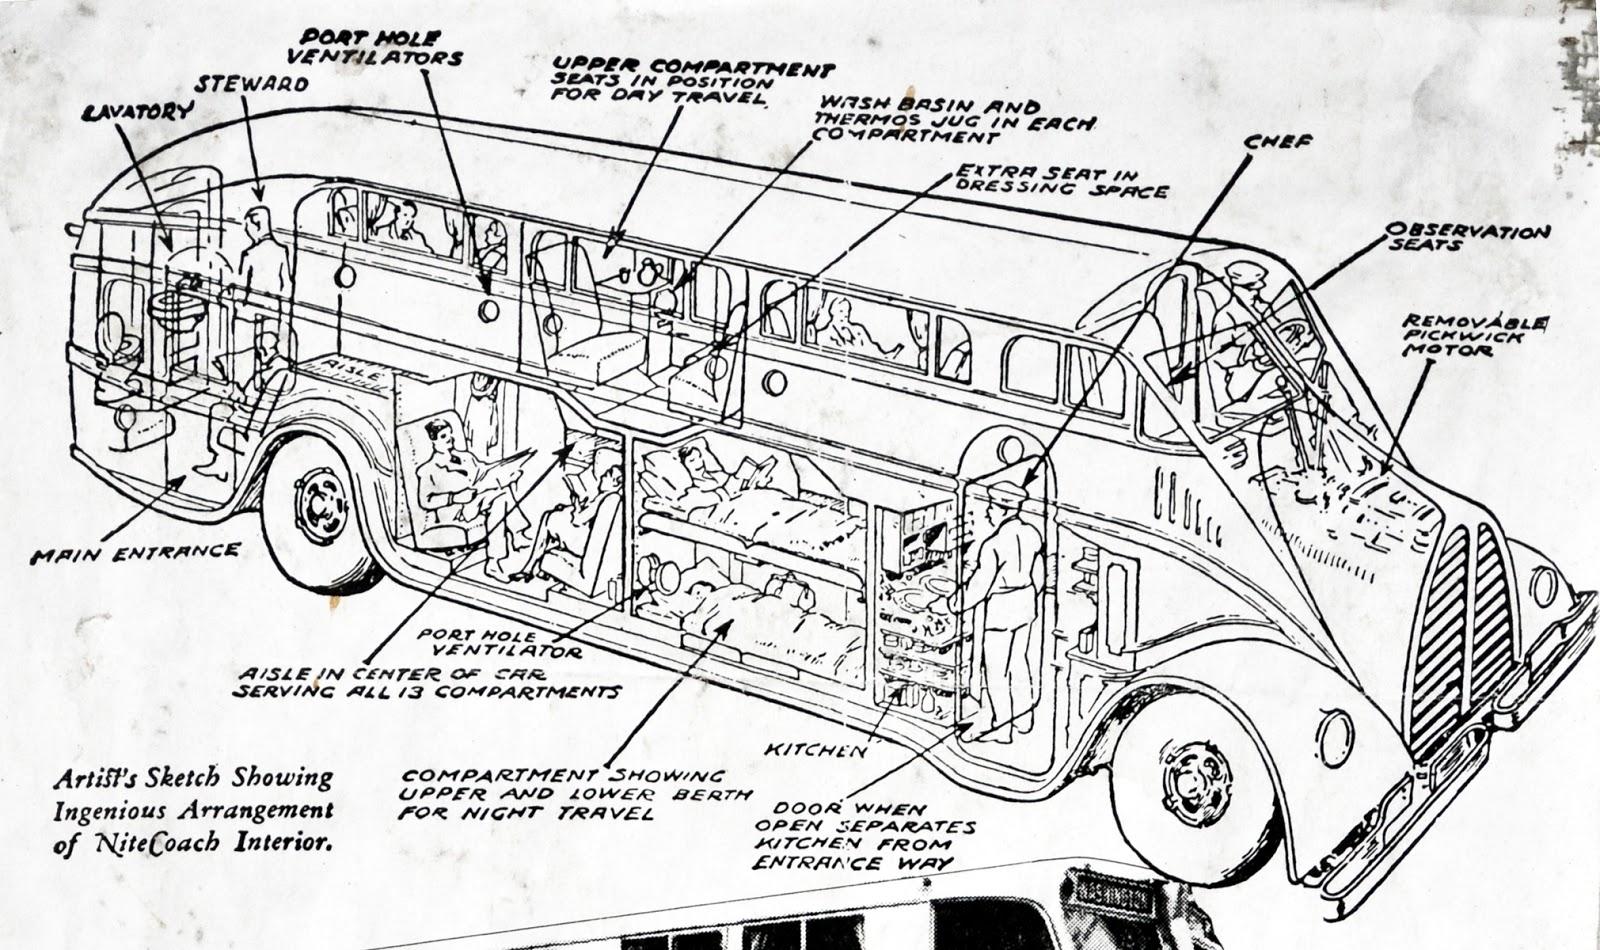 [SCHEMATICS_49CH]  Vw Bus Engine Diagram With Wheelie Bar | Wiring Library | Vw Bus Engine Diagram With Wheelie Bar |  | www.marsshooter.me